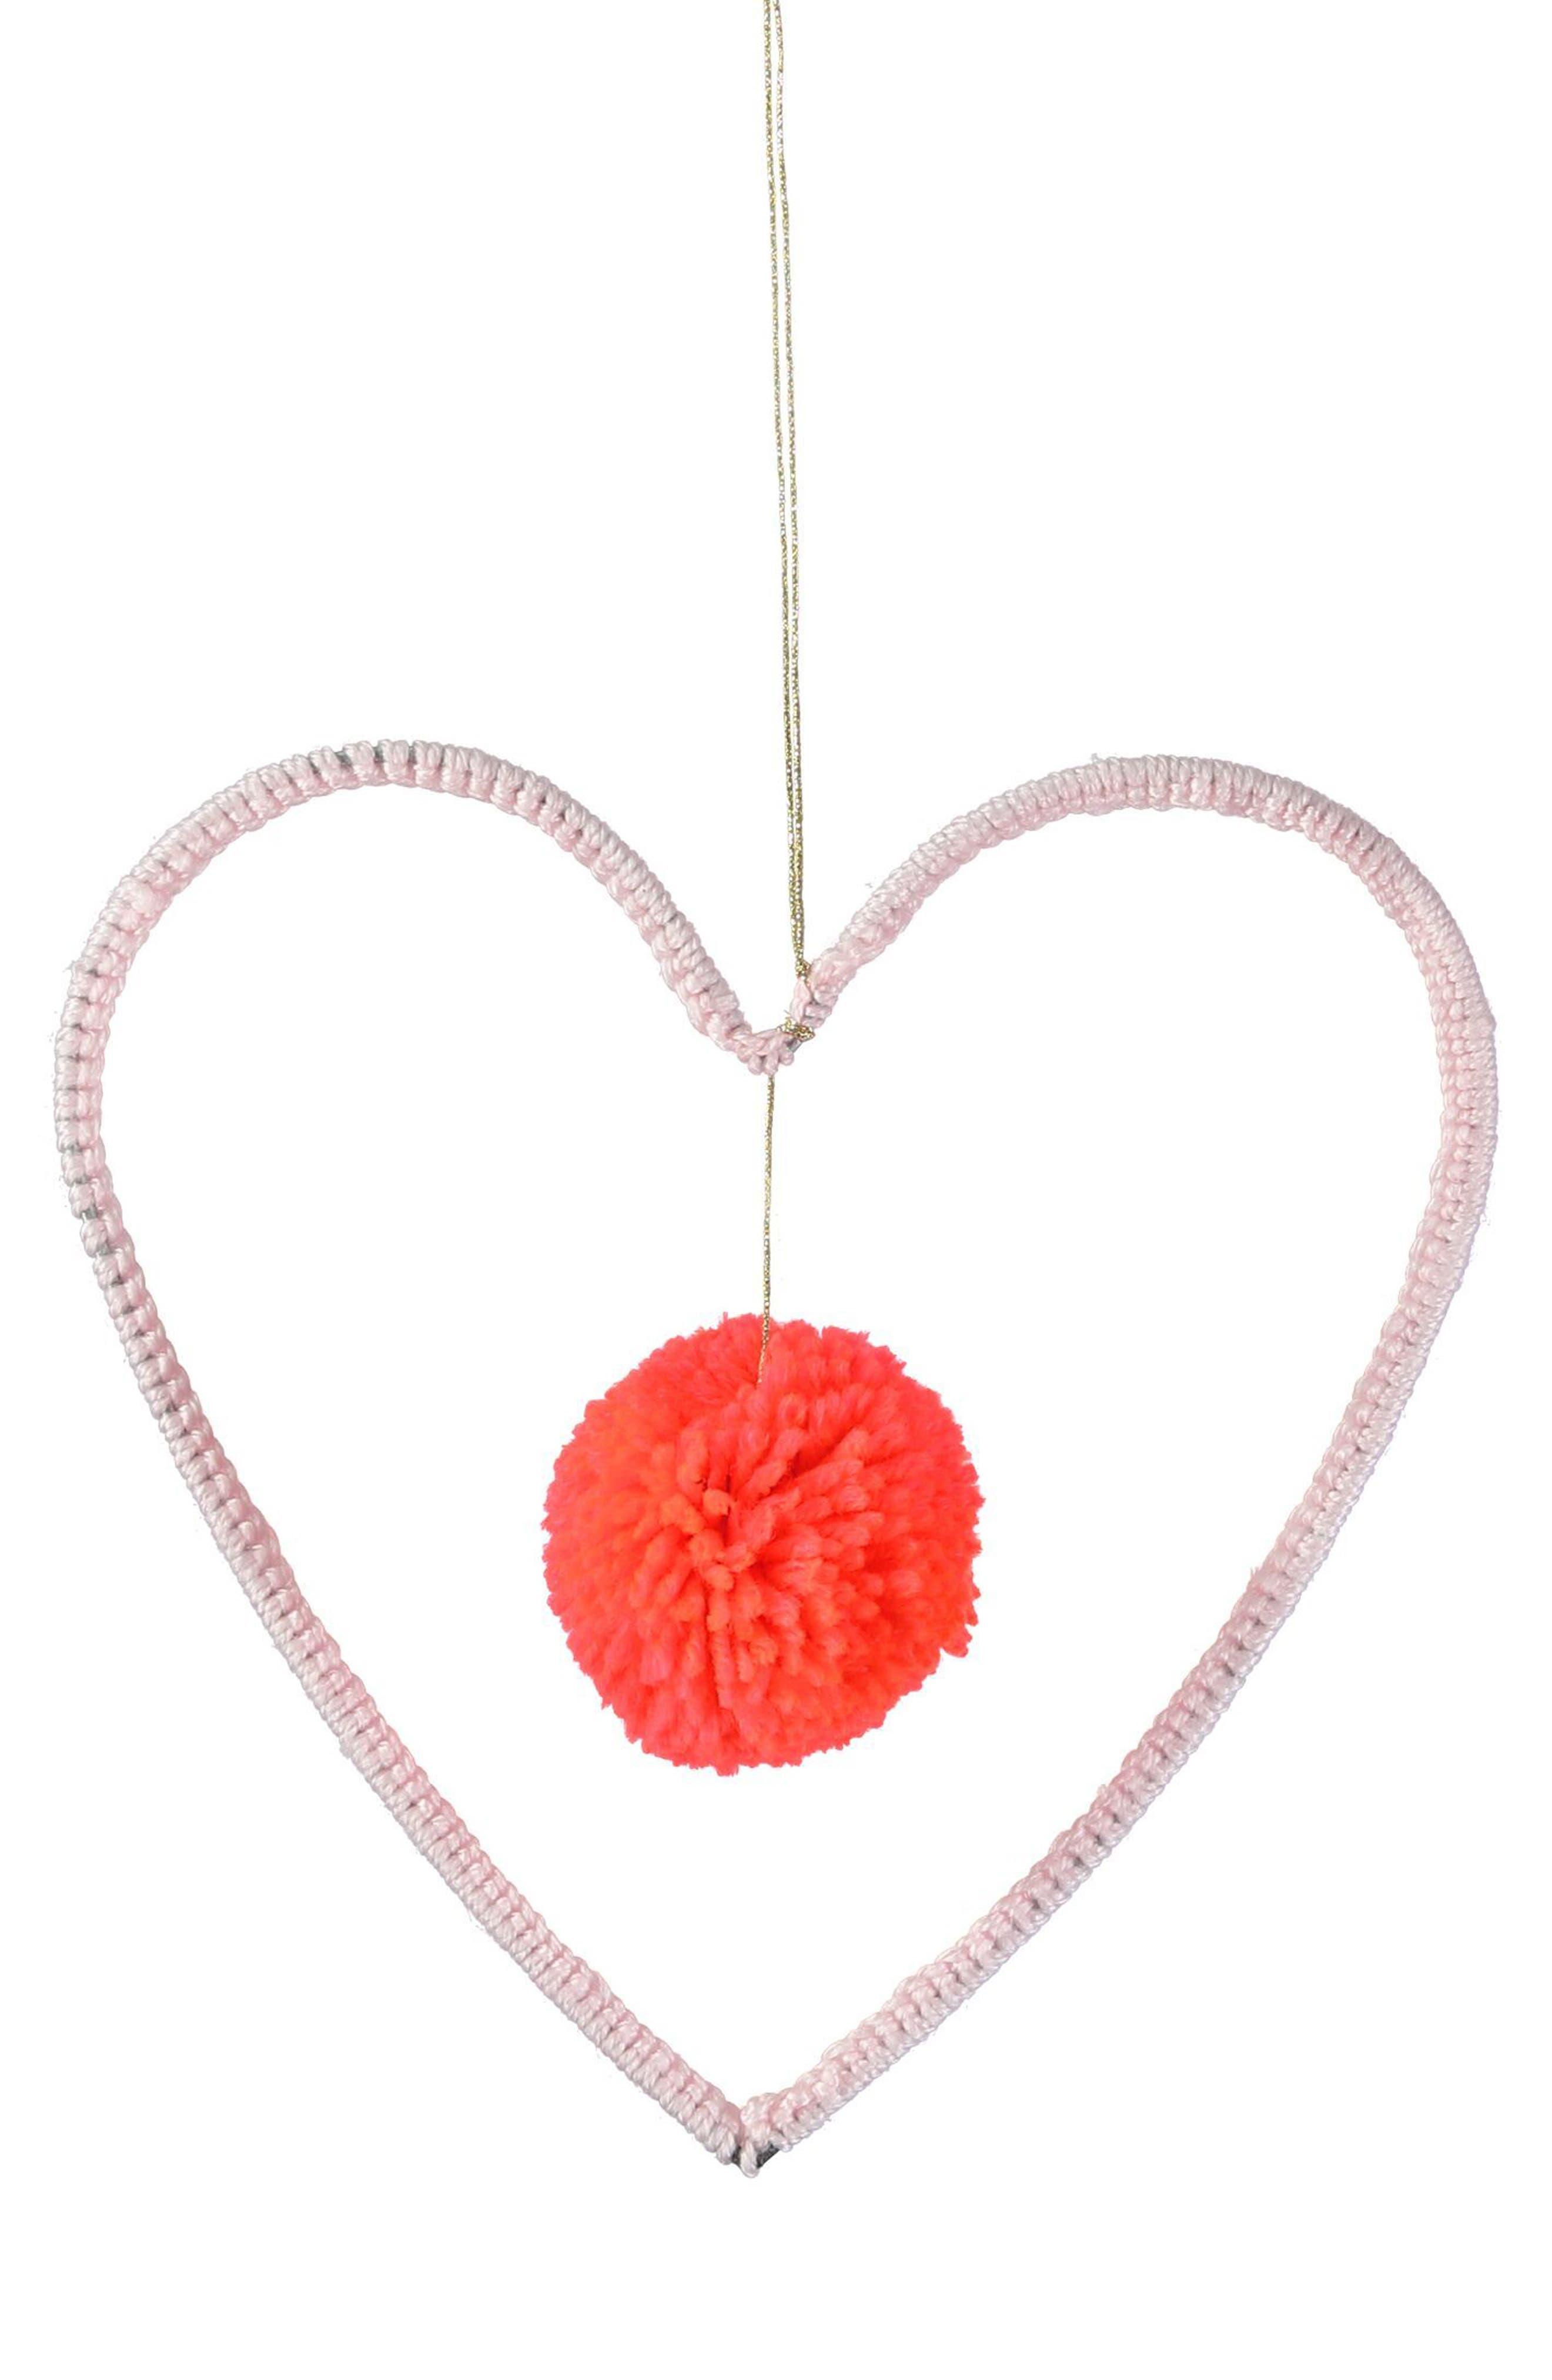 Hanging Heart & Pom Wall Art,                             Main thumbnail 1, color,                             650